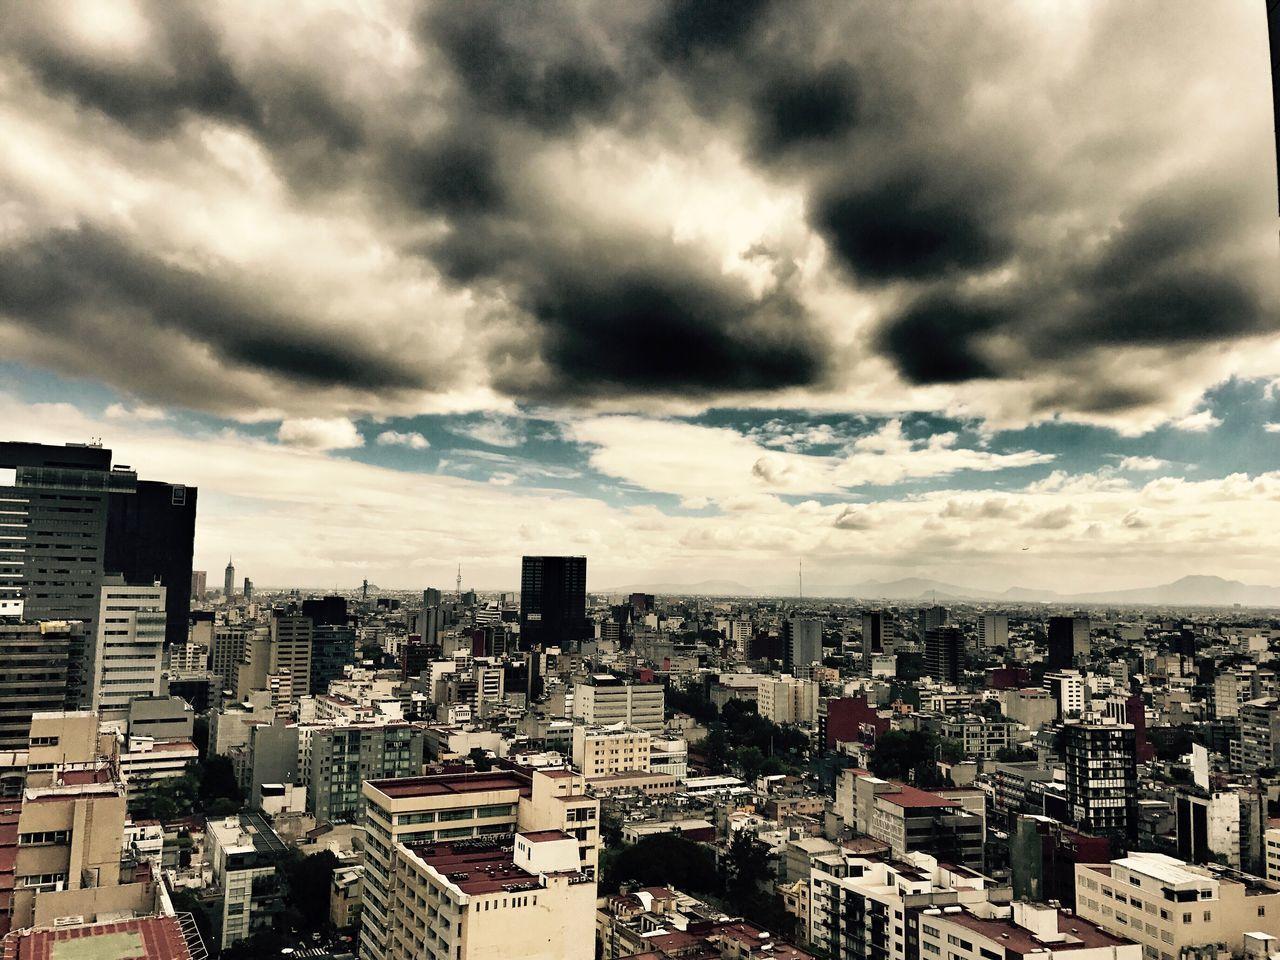 Mexico City, Mexico Architecture Cityscape Cloud - Sky